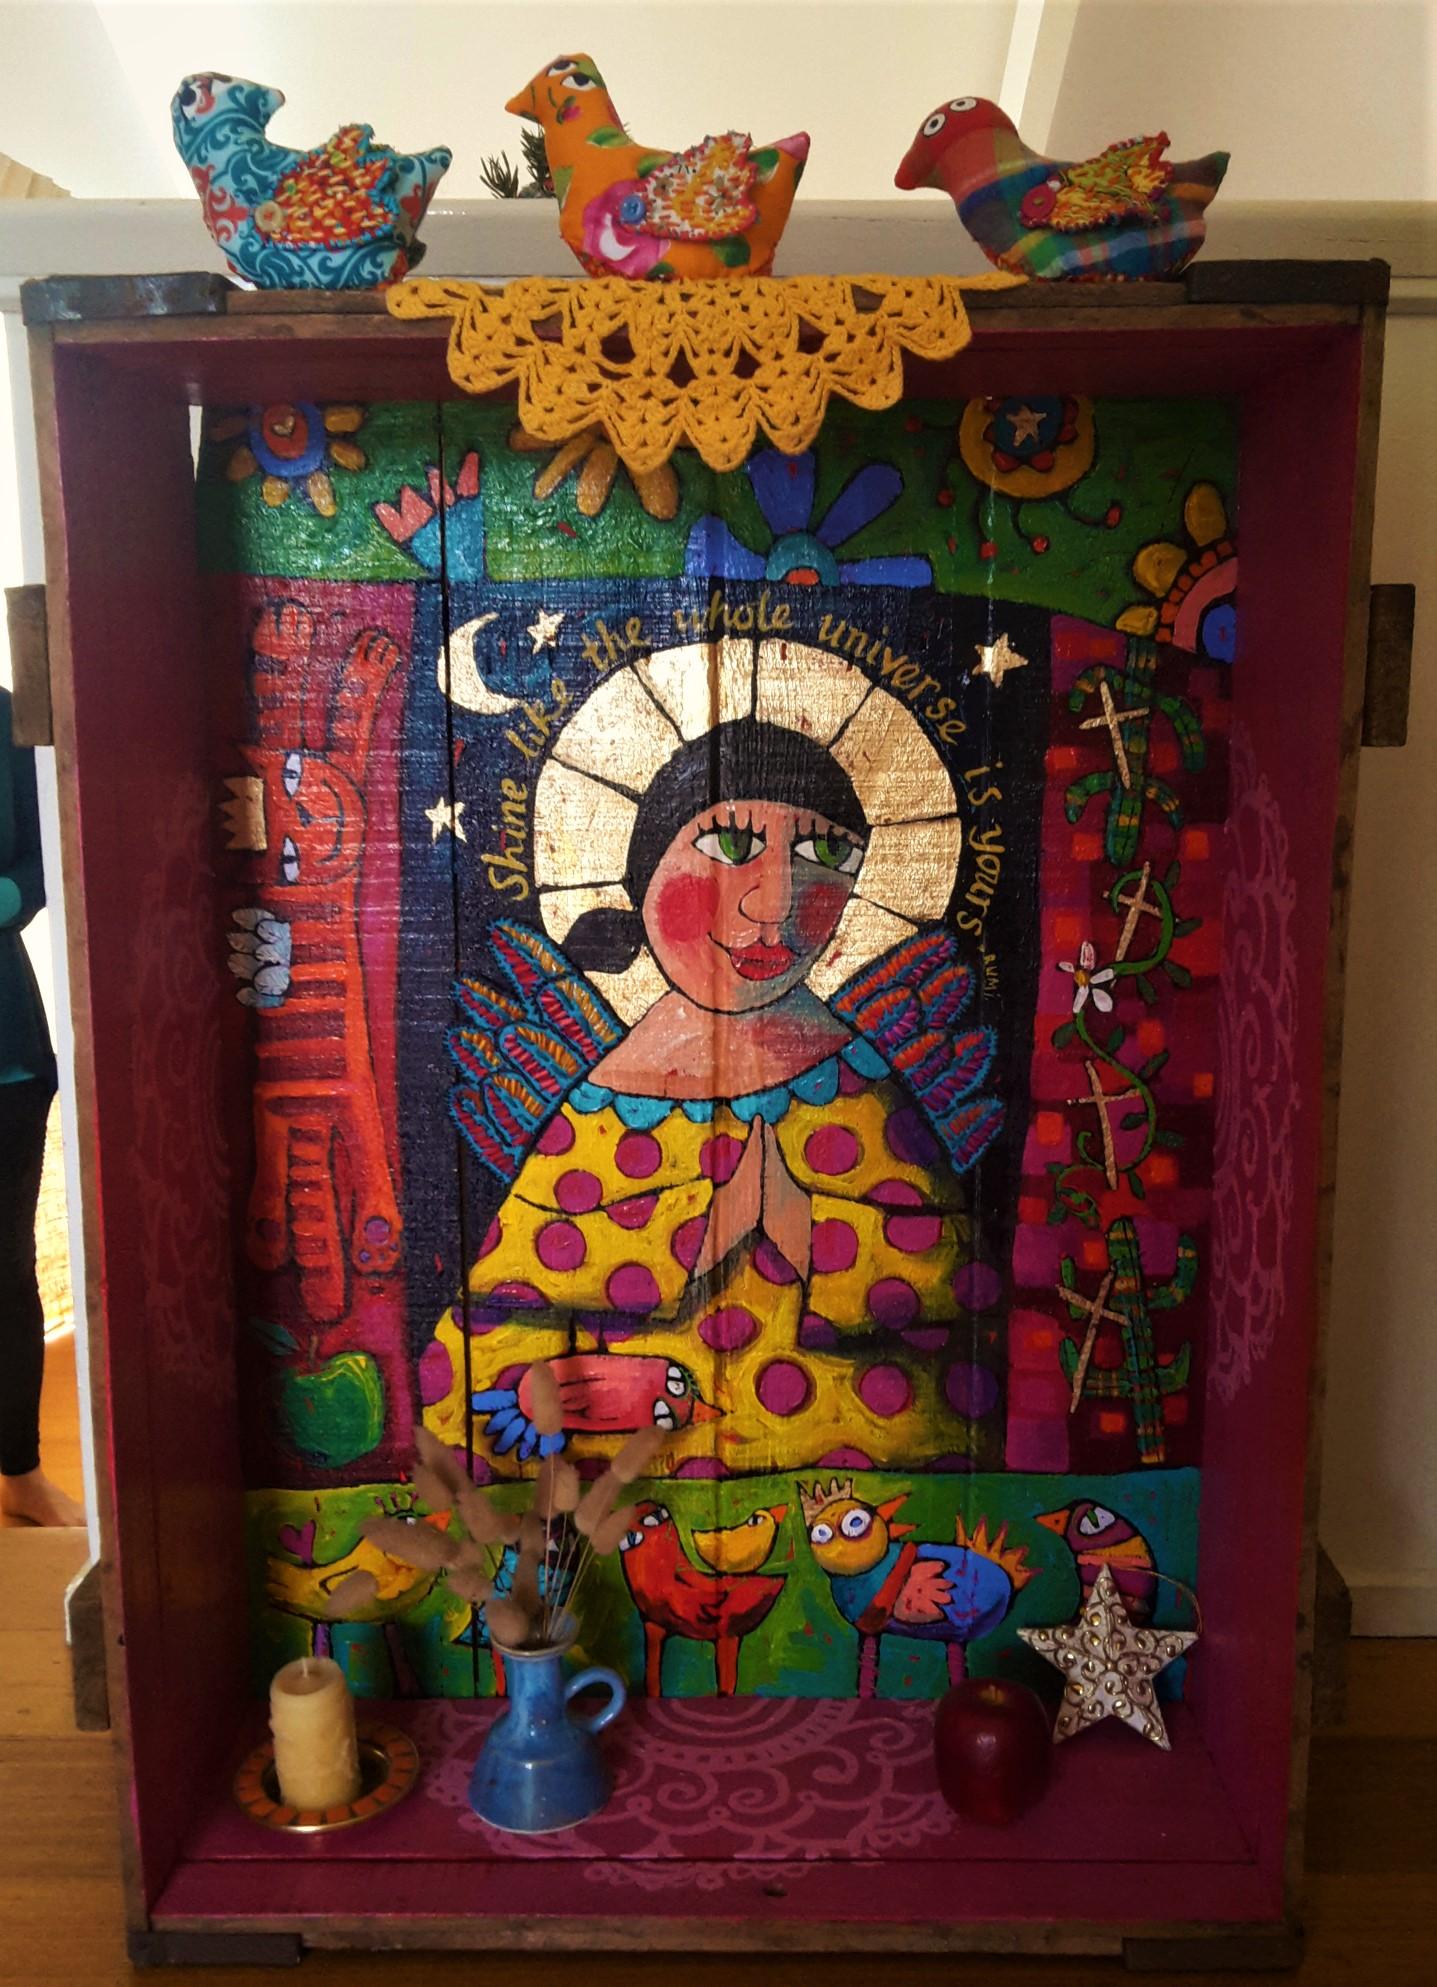 """Shiny shrine of the apple crate Madonna"" by Sara Catena"